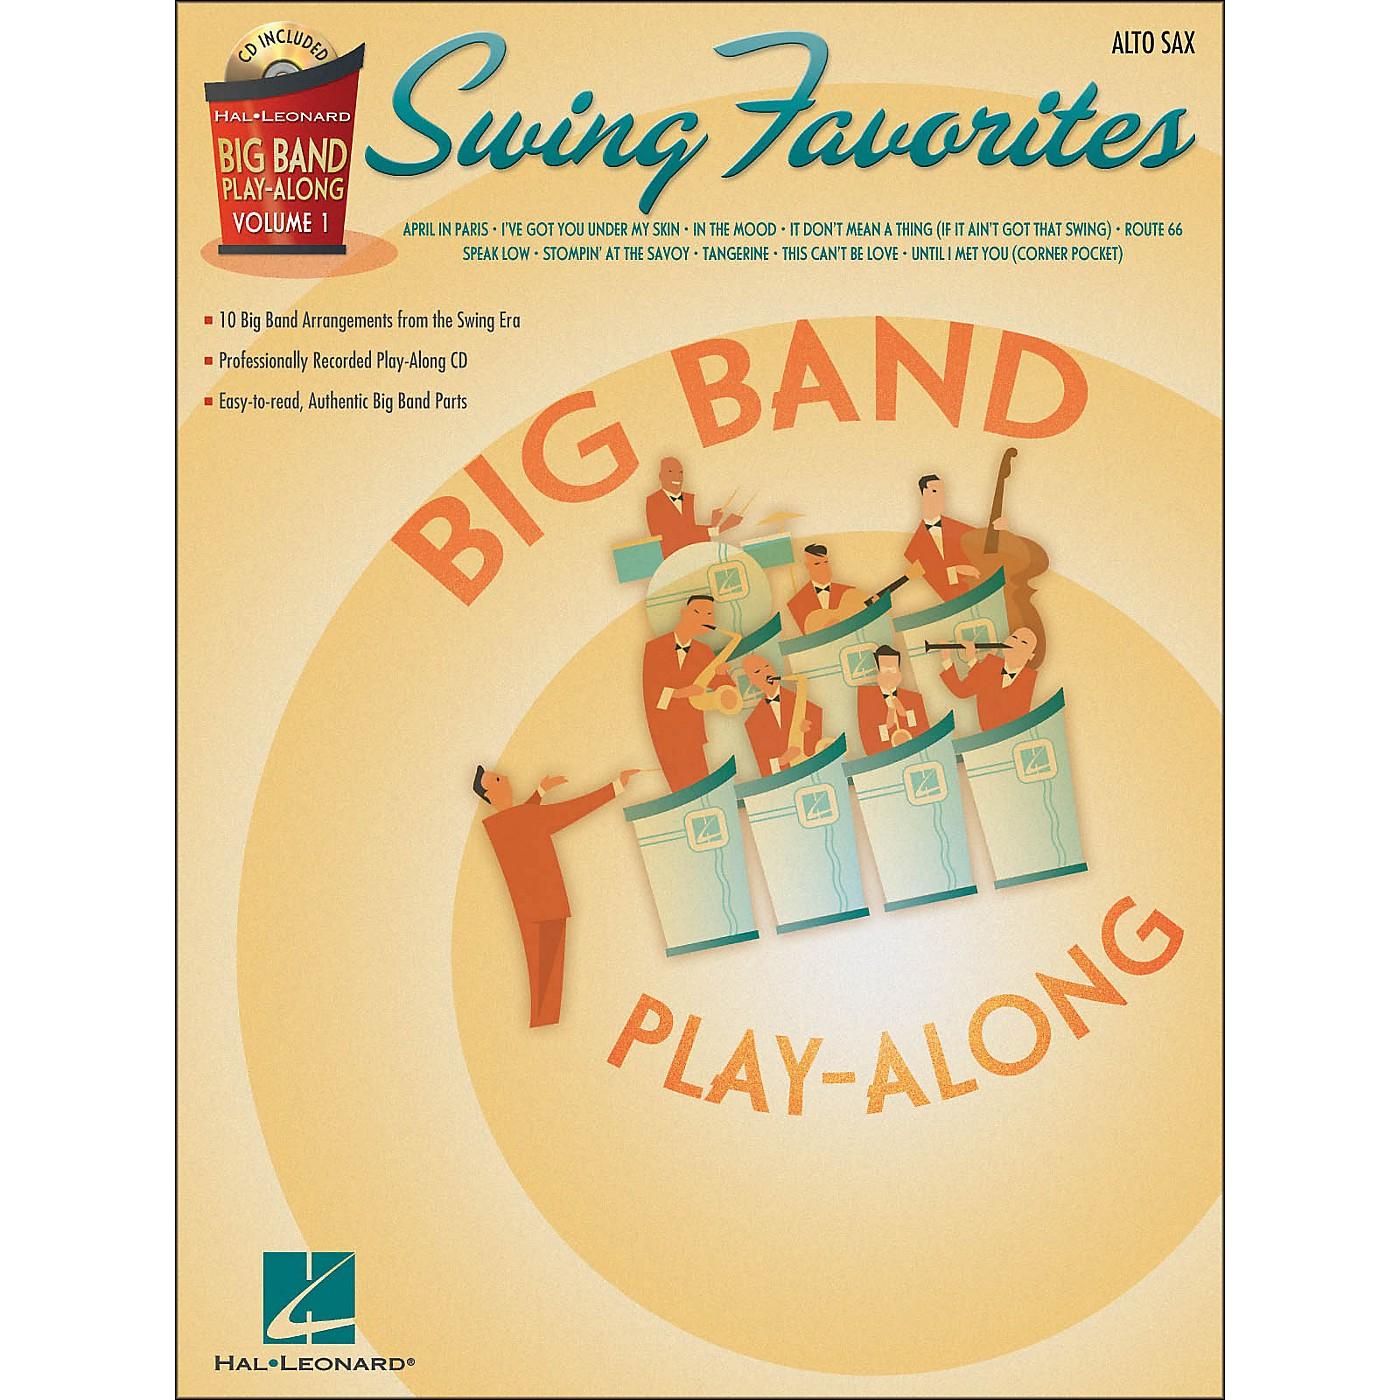 Hal Leonard Swing Favorites Big Band Play-Along Vol. 1 Alto Sax Book/CD thumbnail